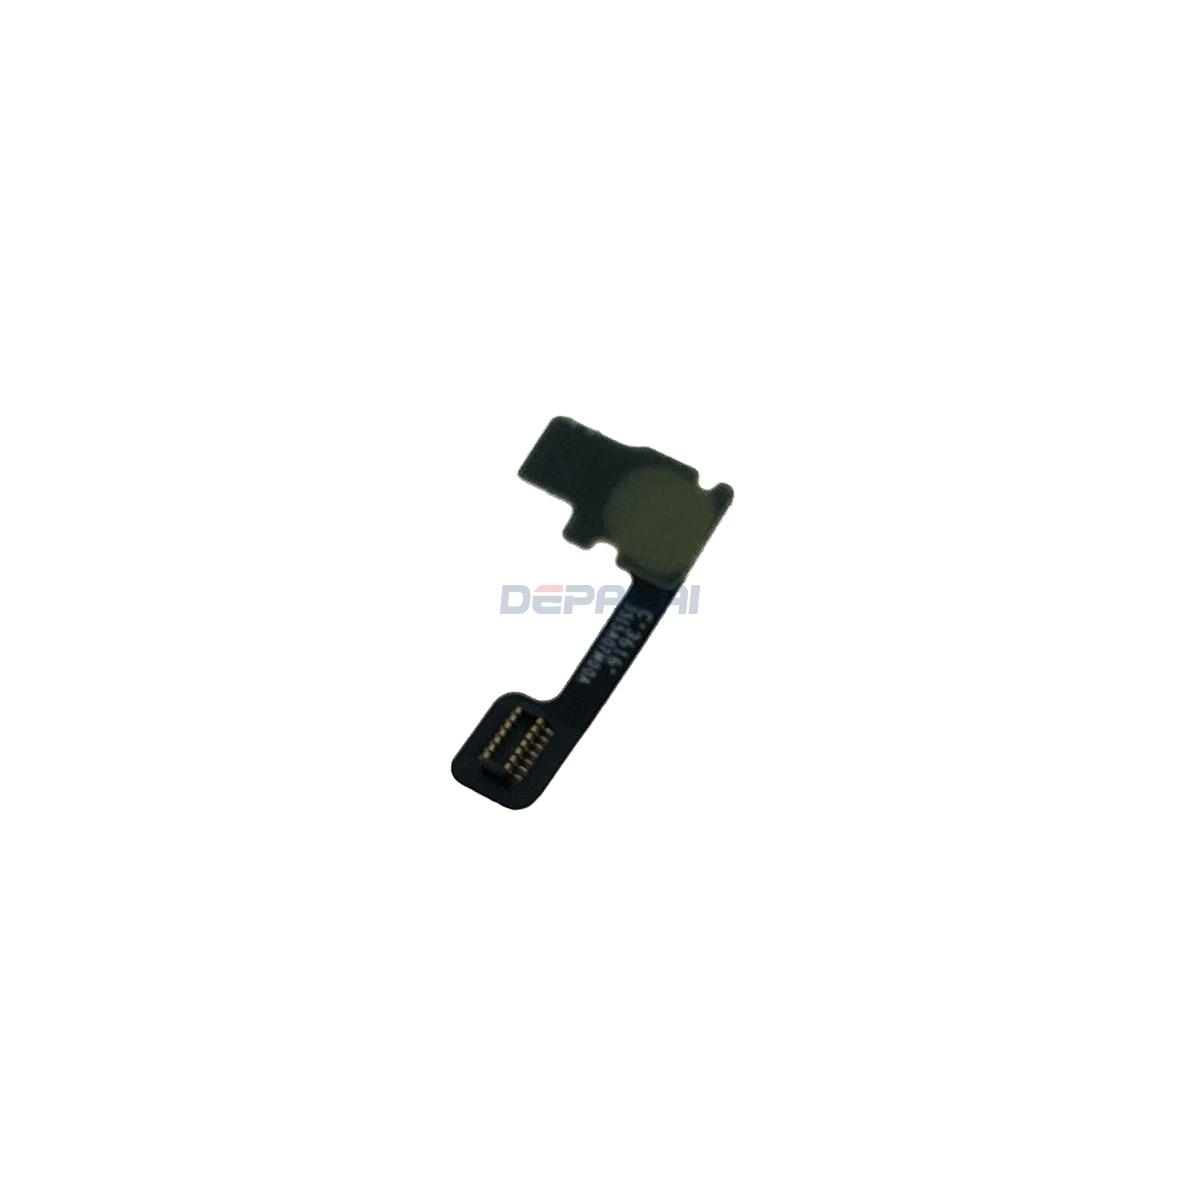 Proximity Light Sensor Flex Cable Distance Sensing Connector For Xiaomi  Mi 5S Replacement Part